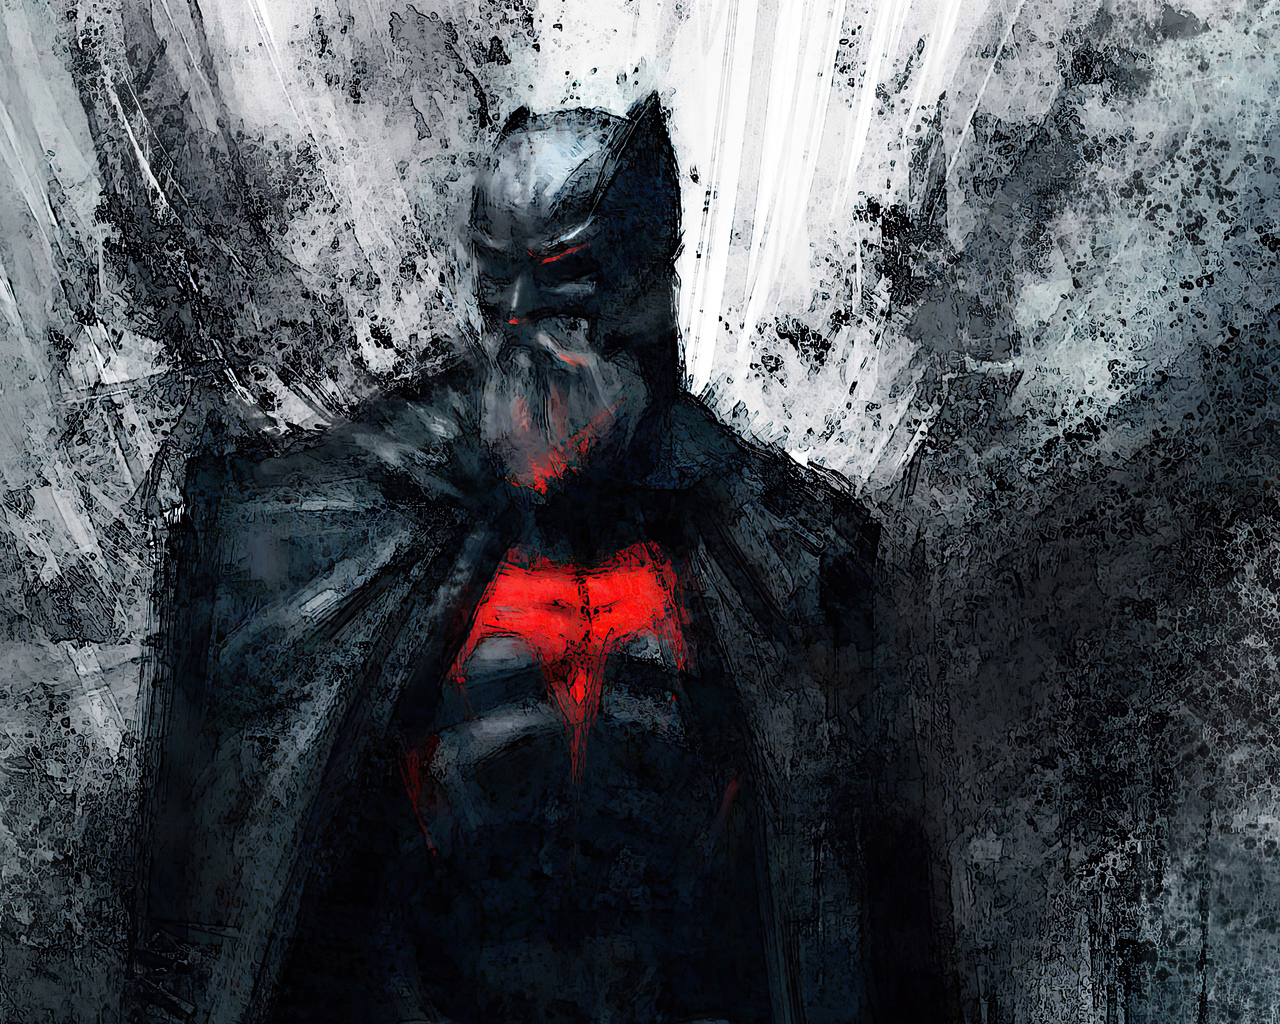 old-batman-2020-4k-c4.jpg